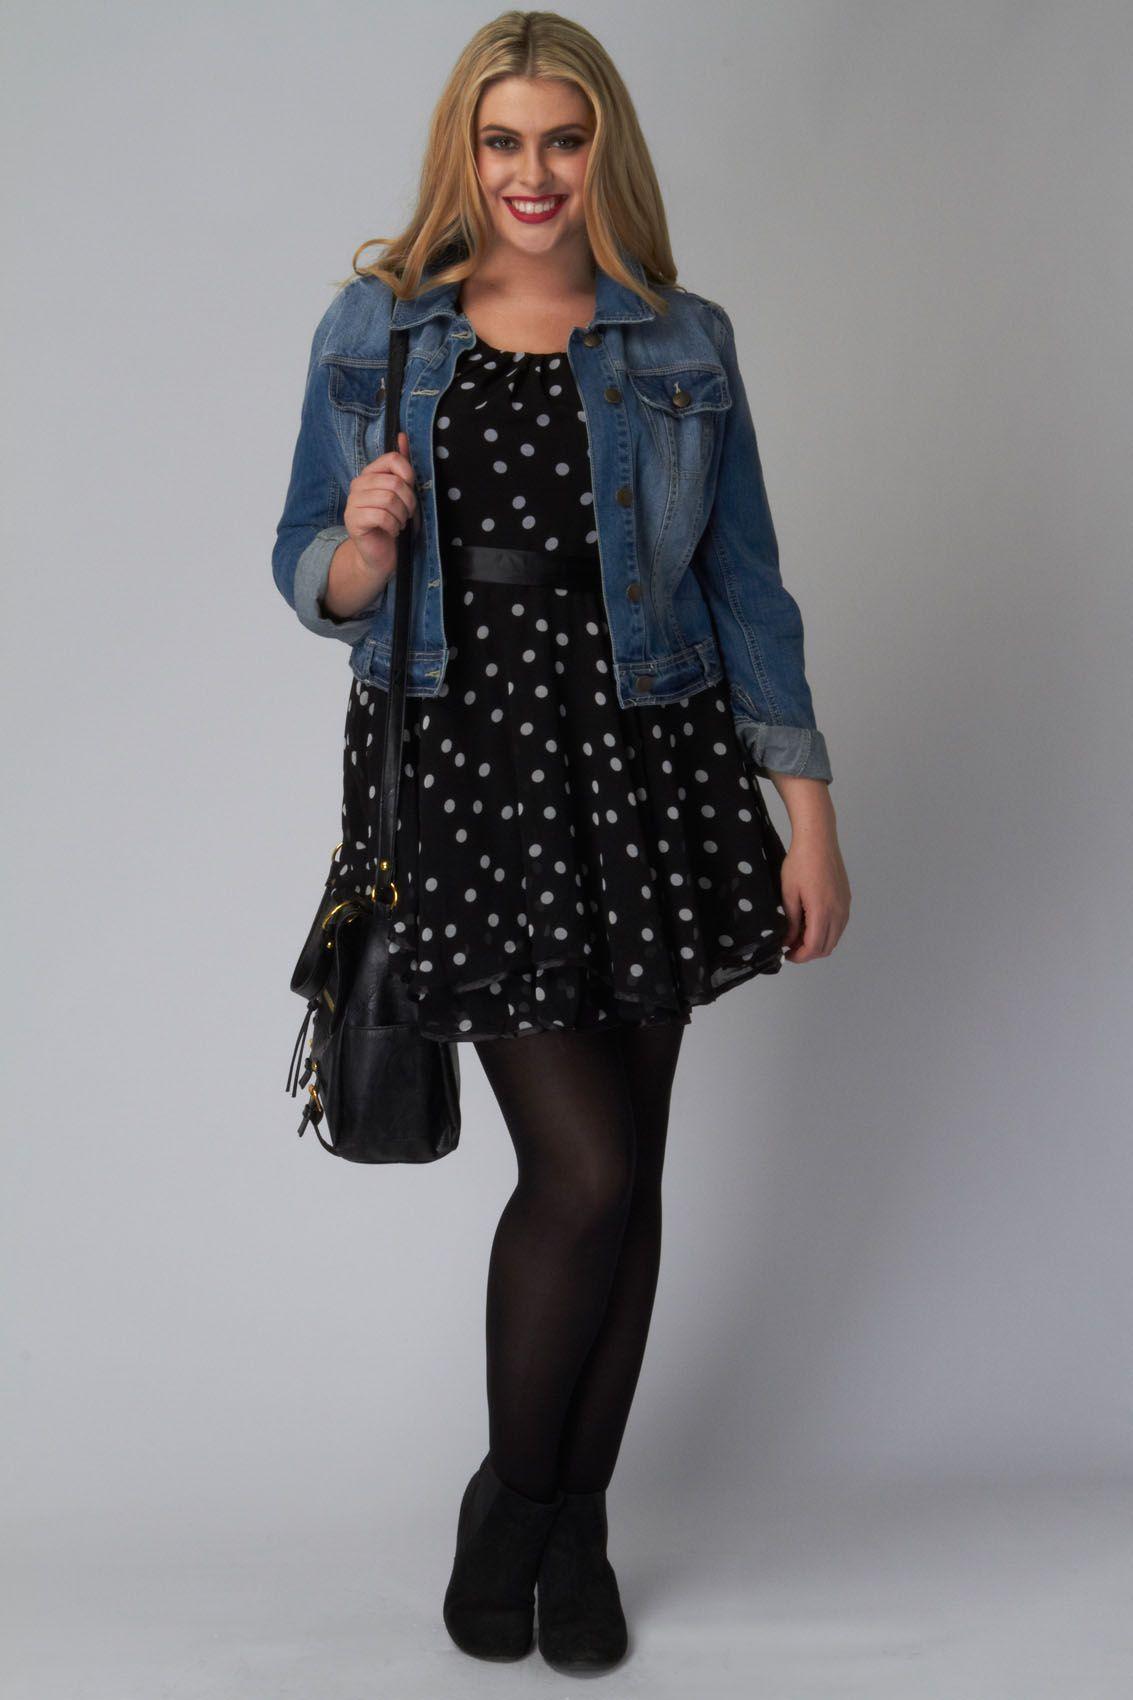 Frilled Black Dress With White Spots Plus Size 16 18 20 22 24 26 Outfits Blusas Armarios [ 1700 x 1133 Pixel ]